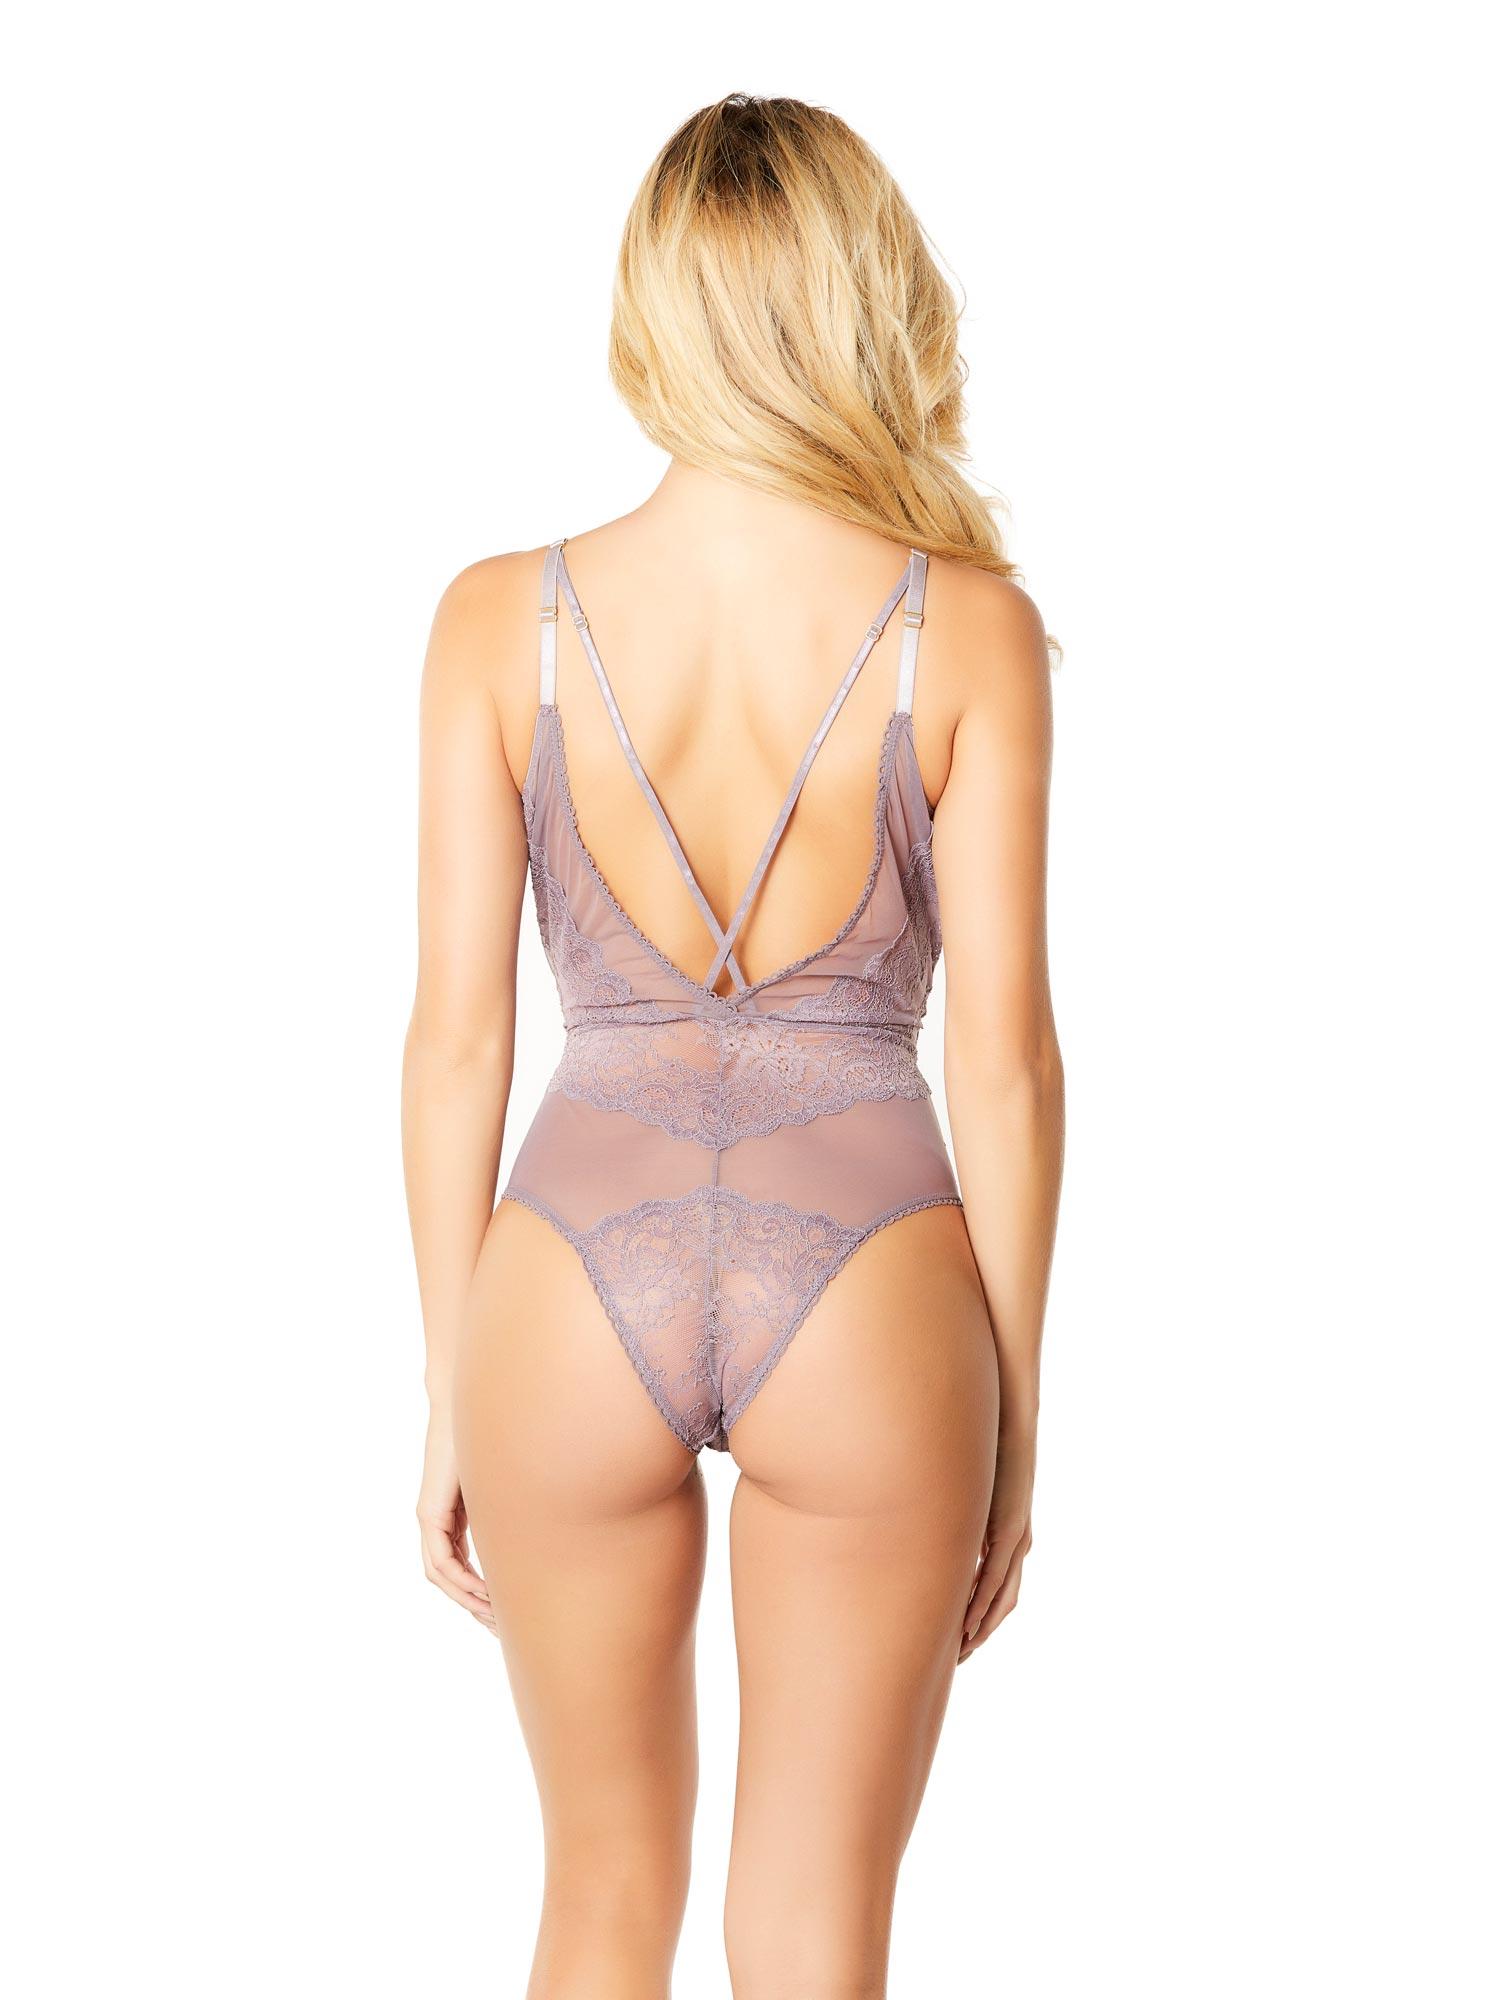 e838f8126db Oh La La Cheri Viviane Teddy Lingerie - Women s for sale online